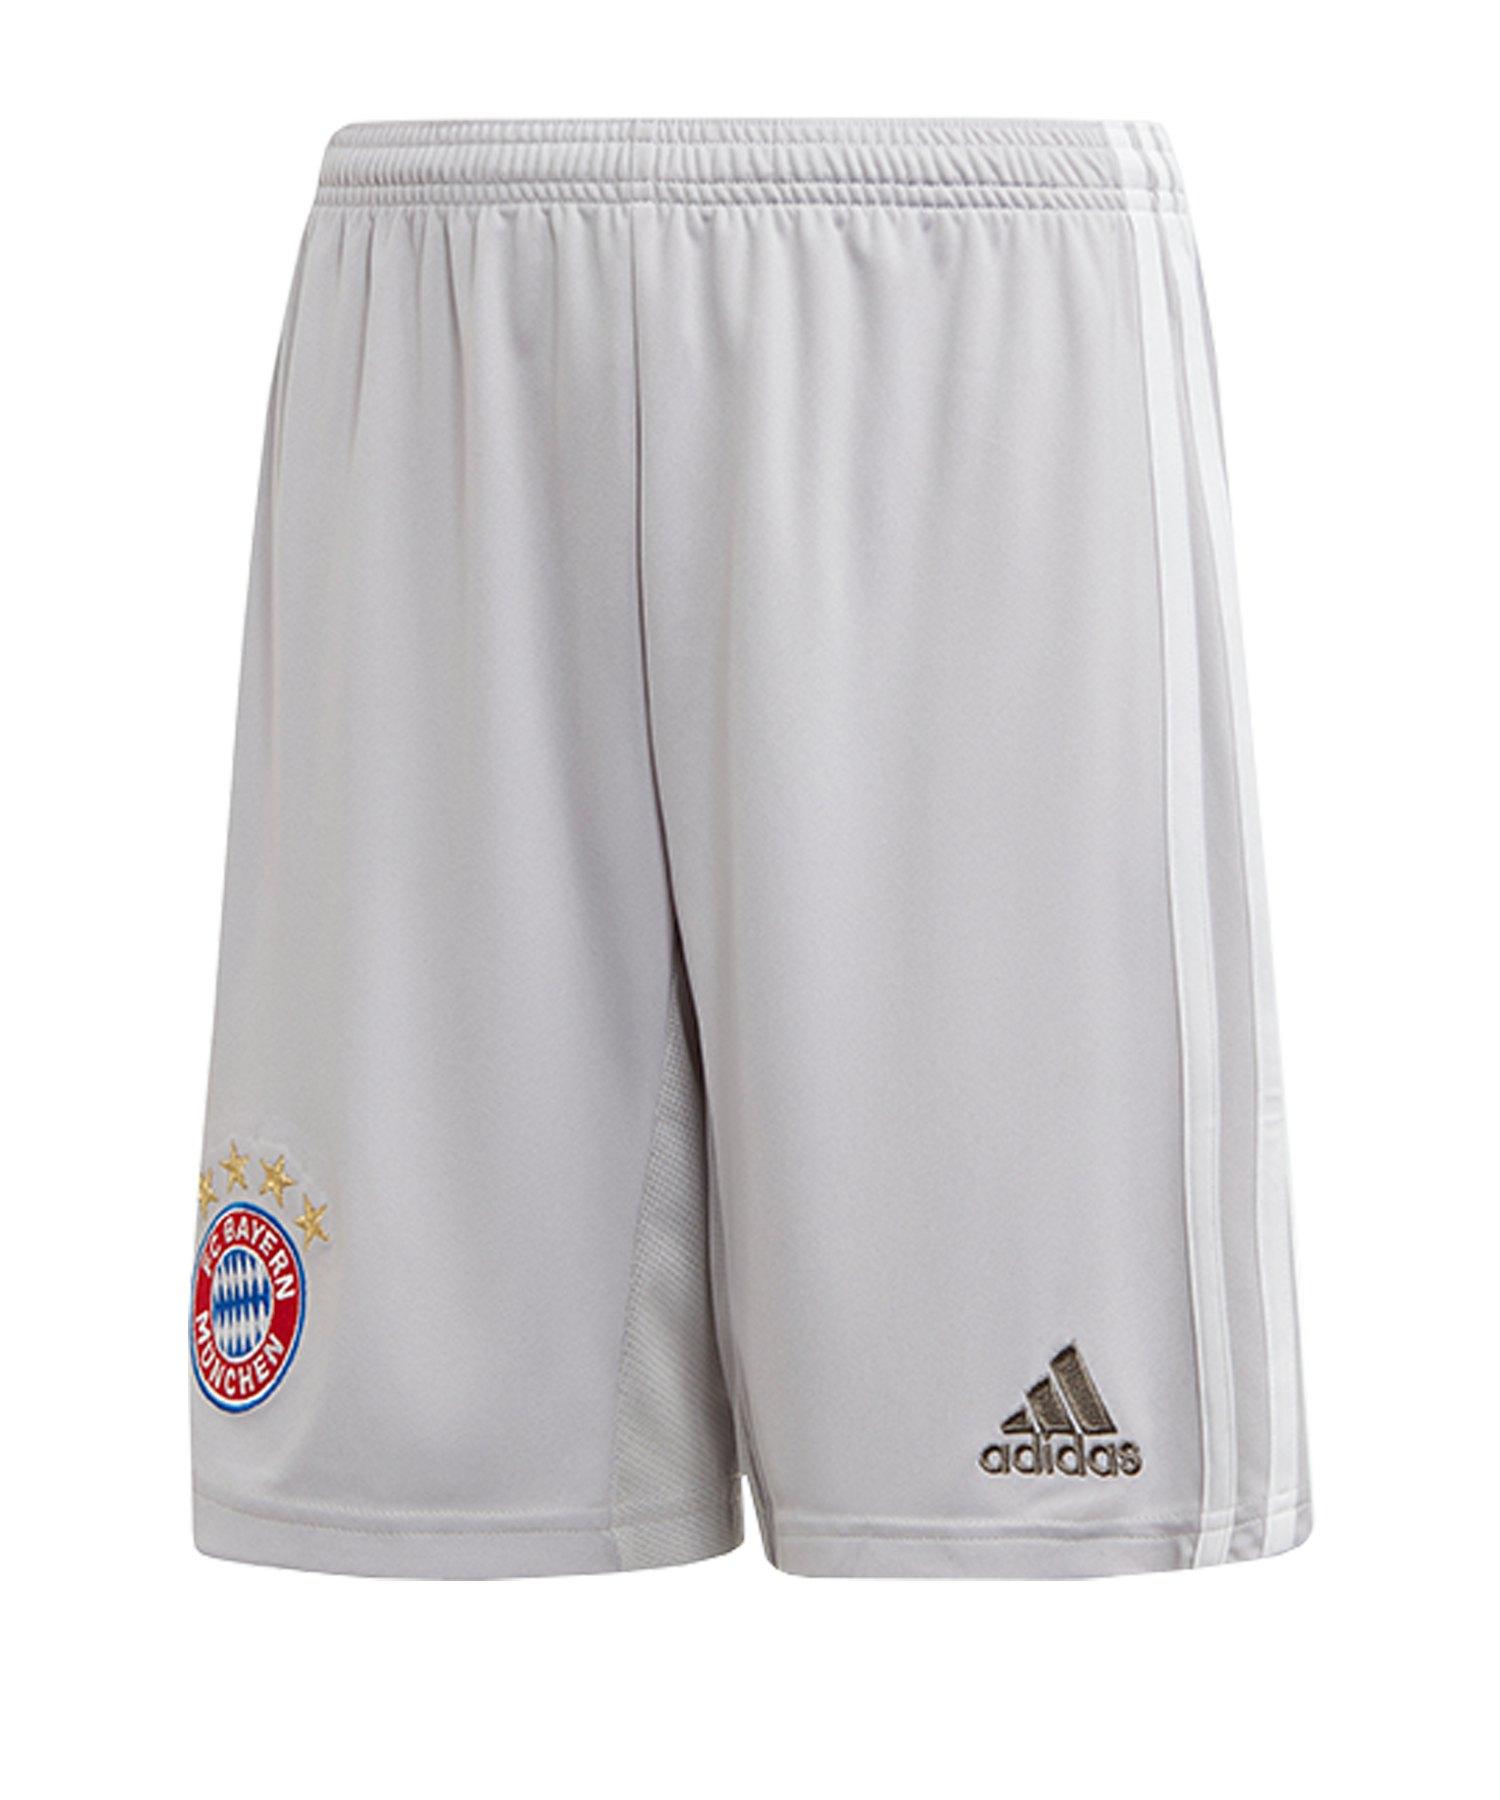 adidas FC Bayern München Short Away 2019/2020 Kids - grau